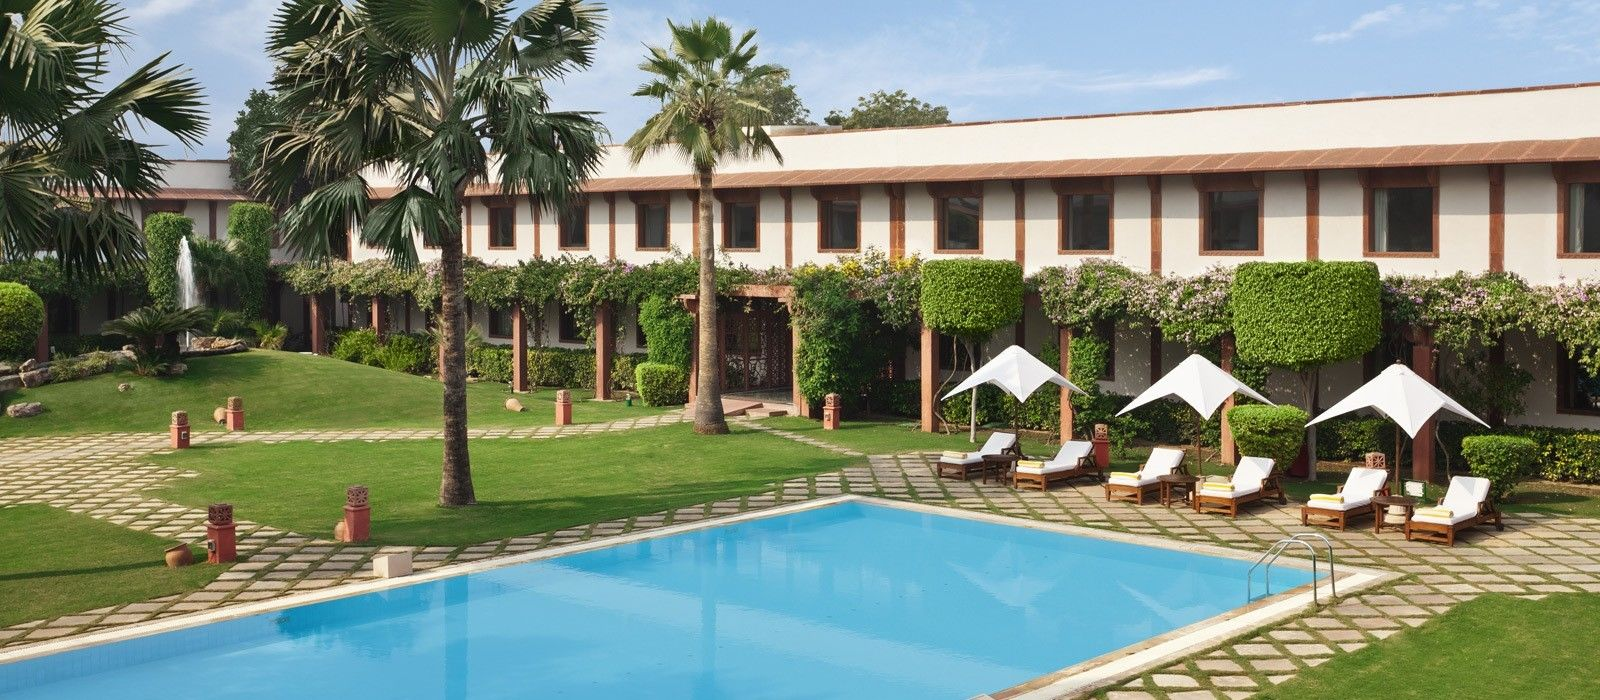 Hotel The Trident Agra Nordindien